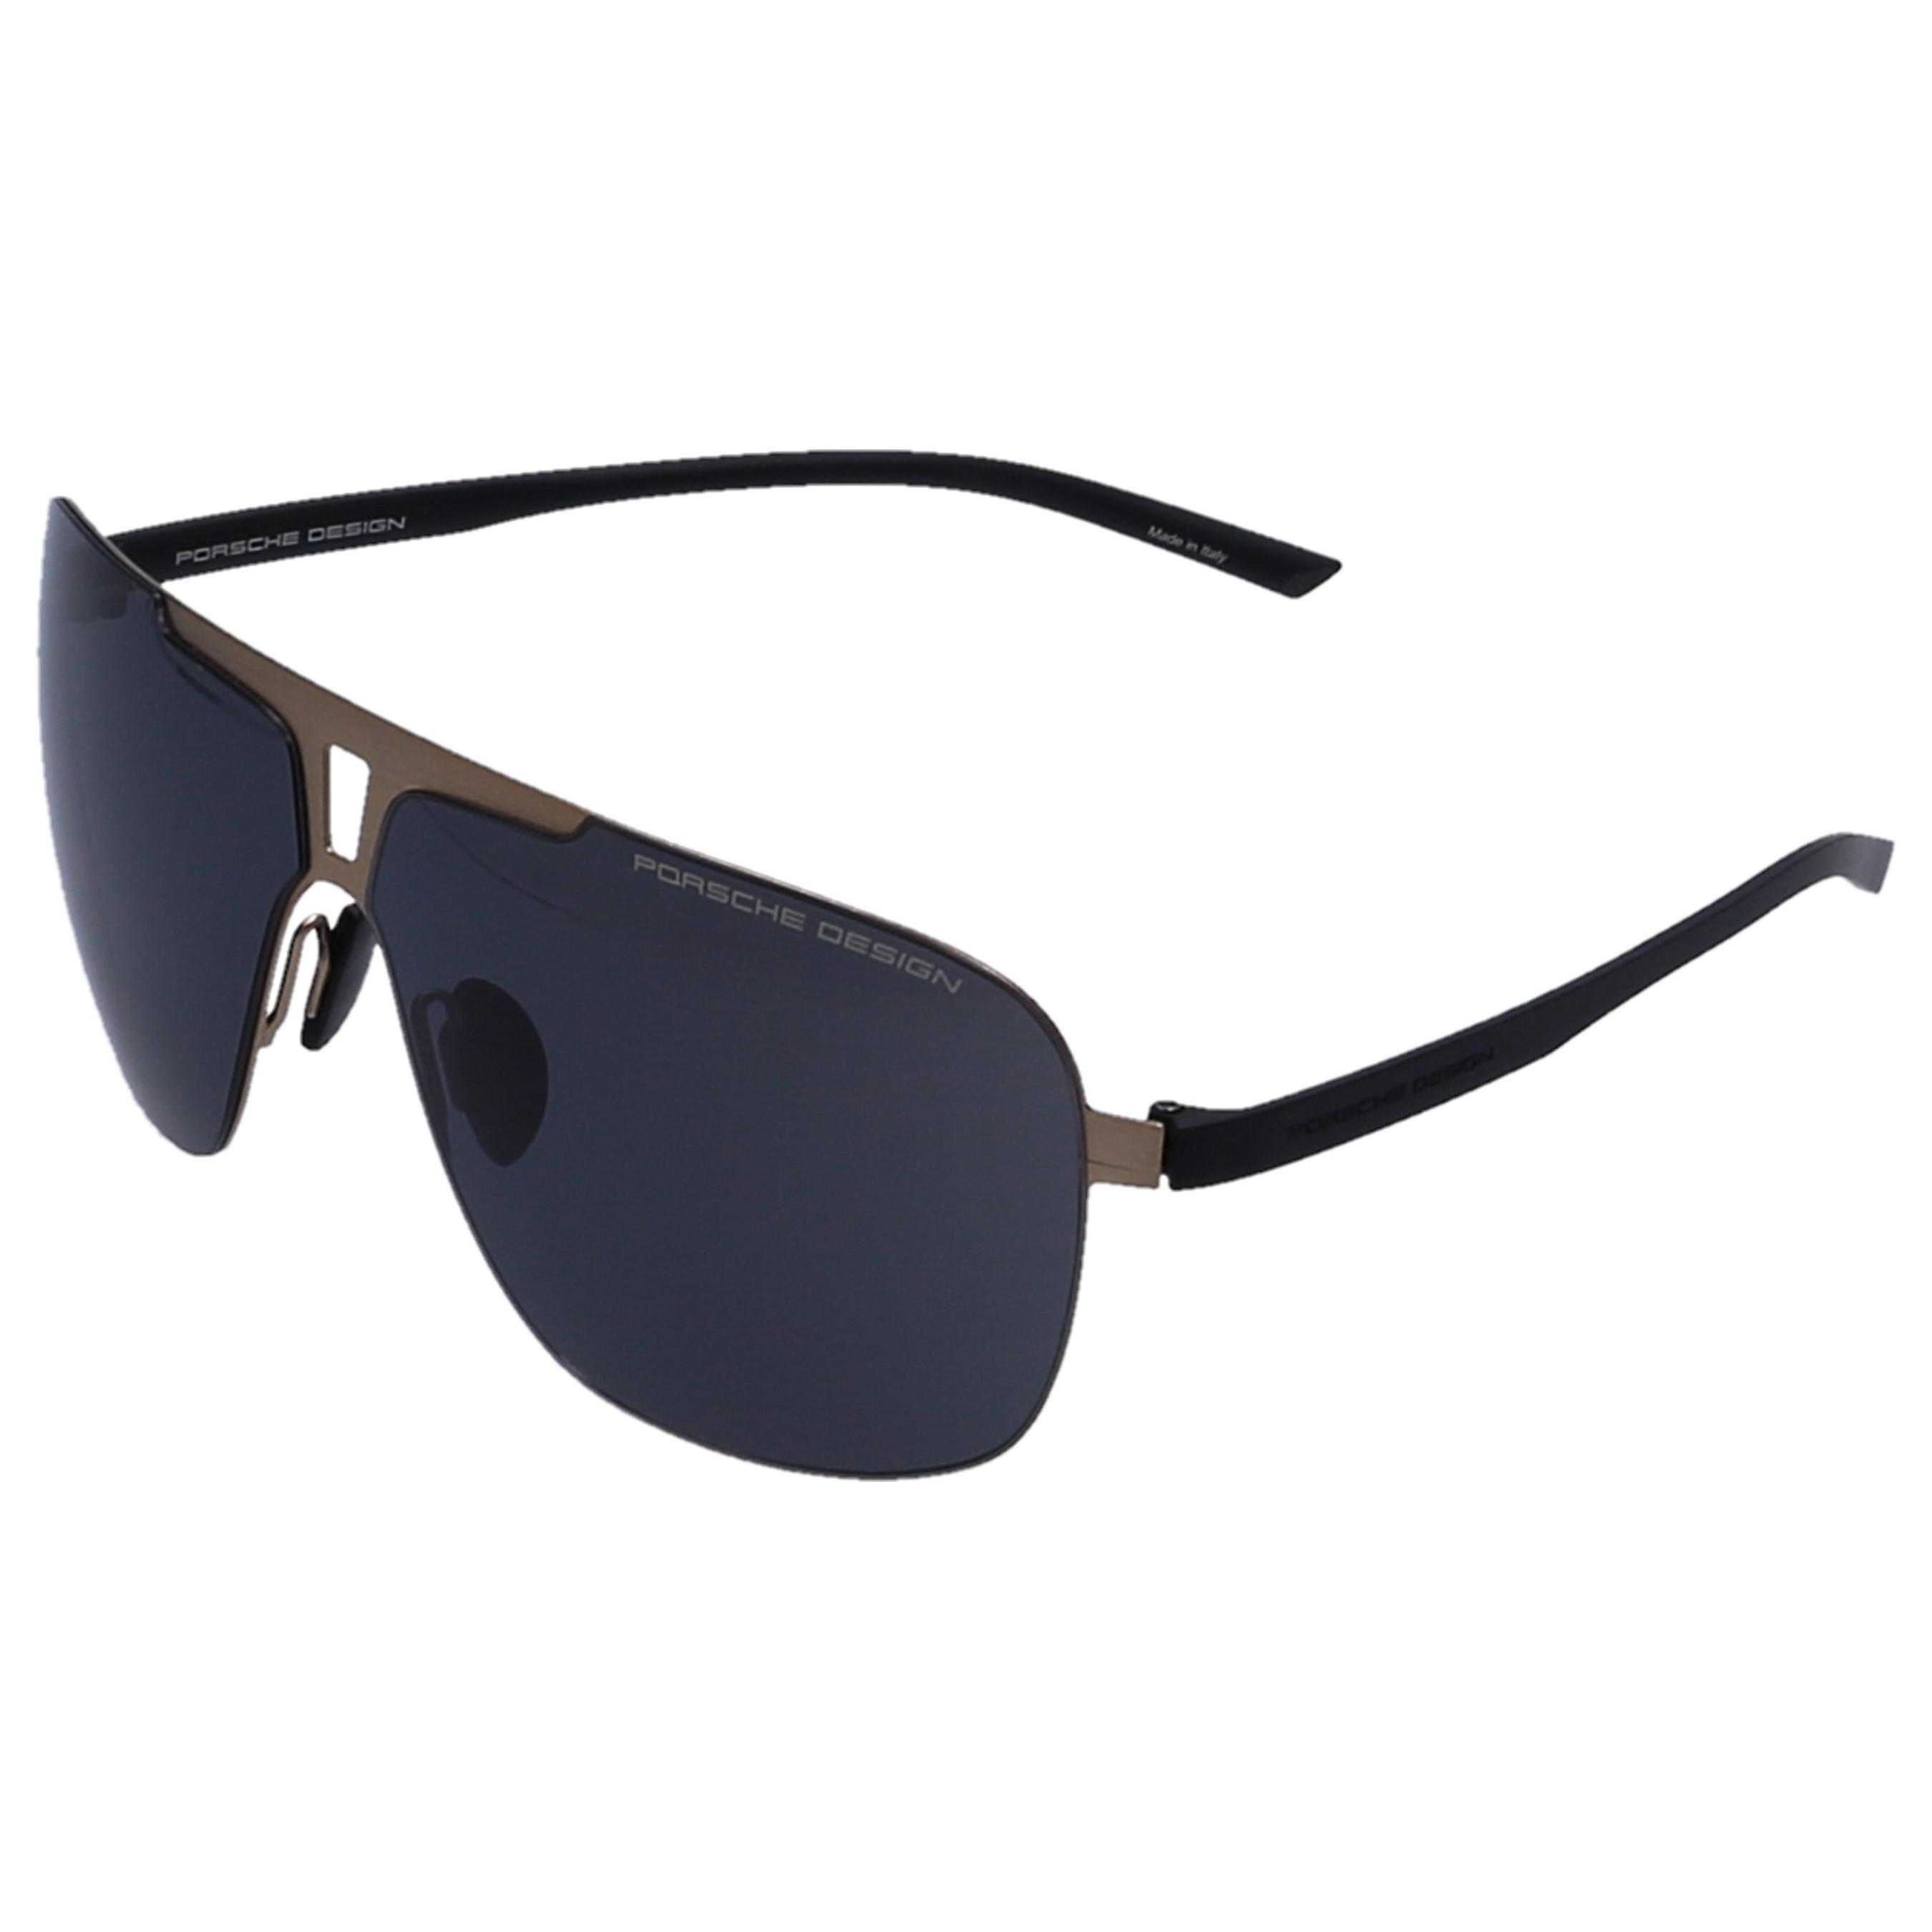 33d96bd6a2c Porsche Design - White Men Sunglasses Aviator 8655 Acetate Black for Men -  Lyst. View fullscreen